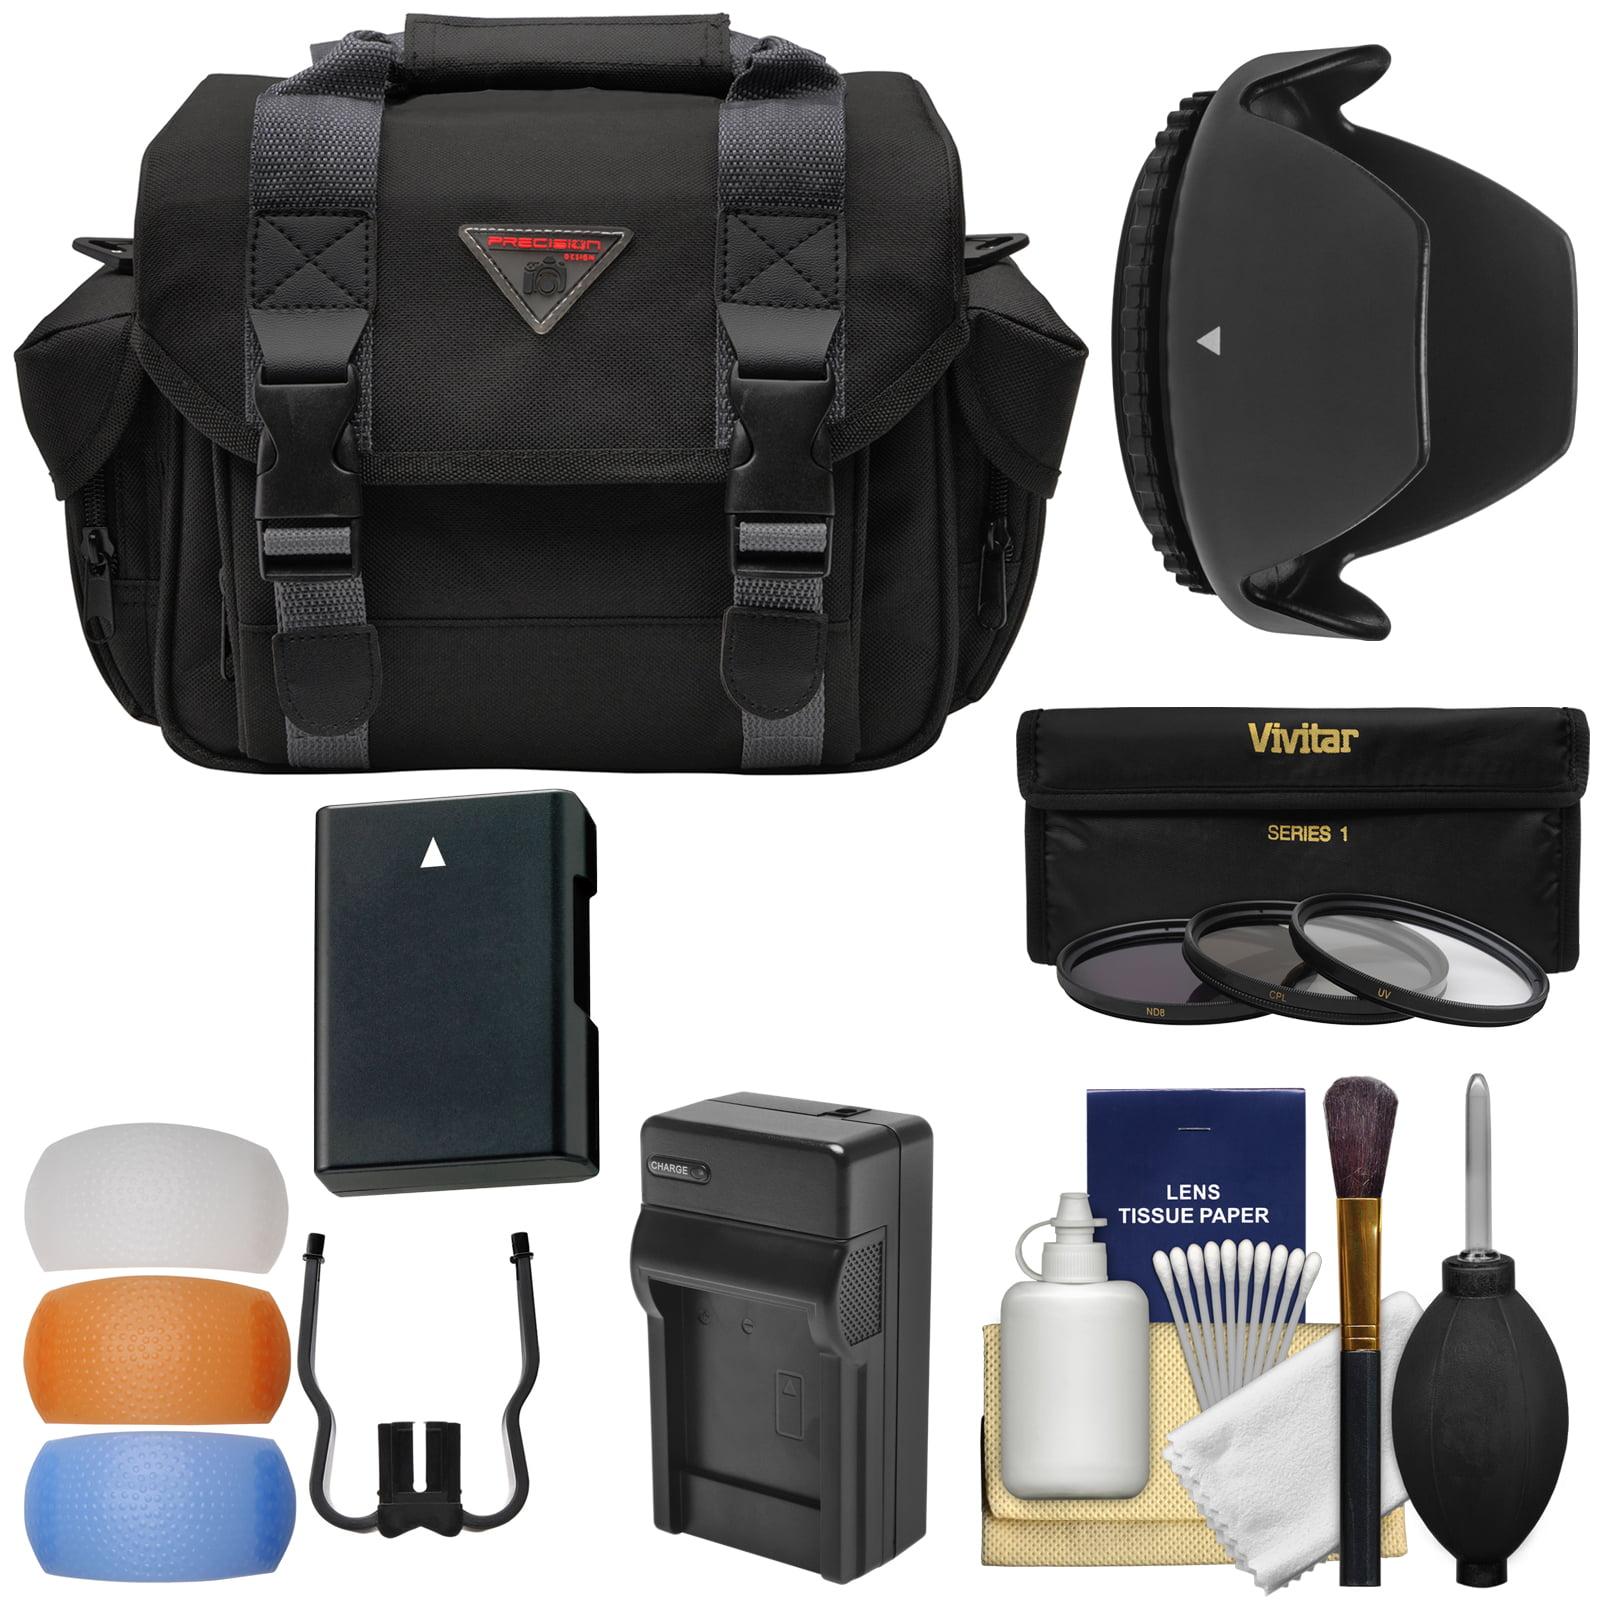 Essentials Bundle for Nikon D3200 D3200, D3300, D5200, D5300, D5500 Camera & 18-55mm VR Lens with Case + Battery & Charger + 3 (UV/CPL/ND8) Filters + Hood + Kit